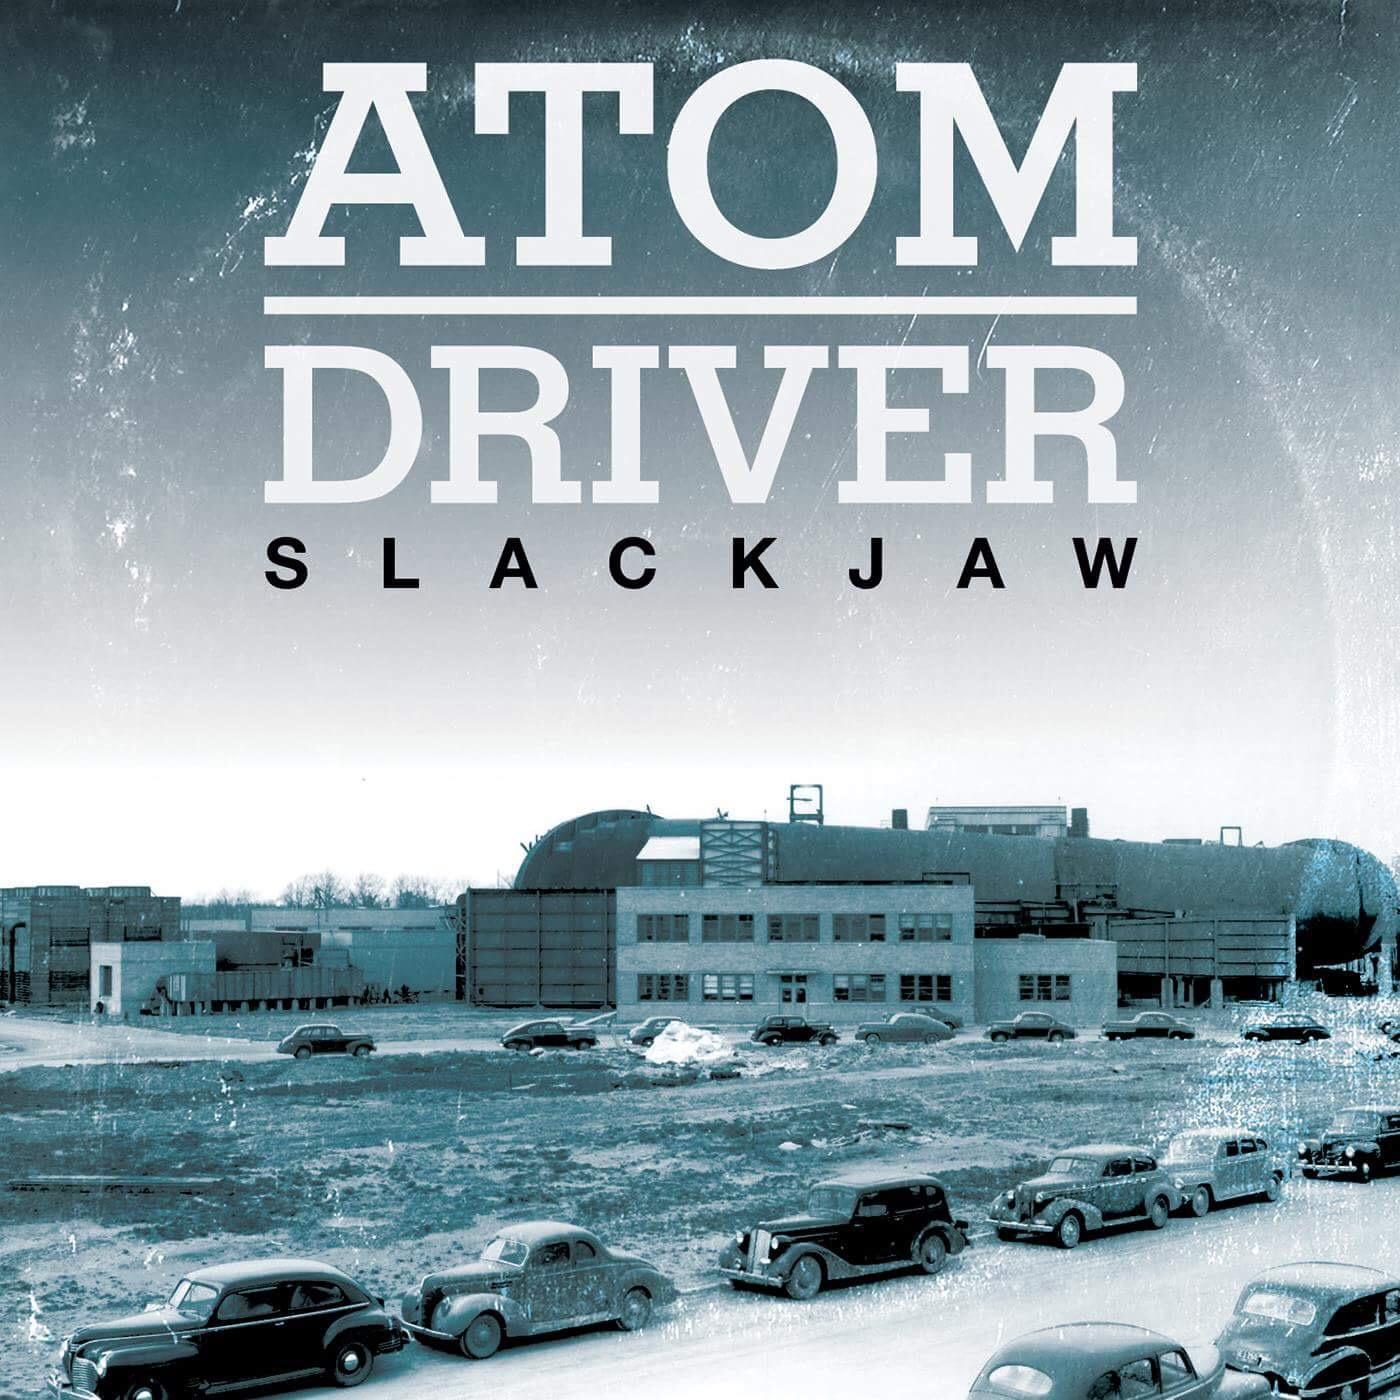 Atom Driver - Slackjaw